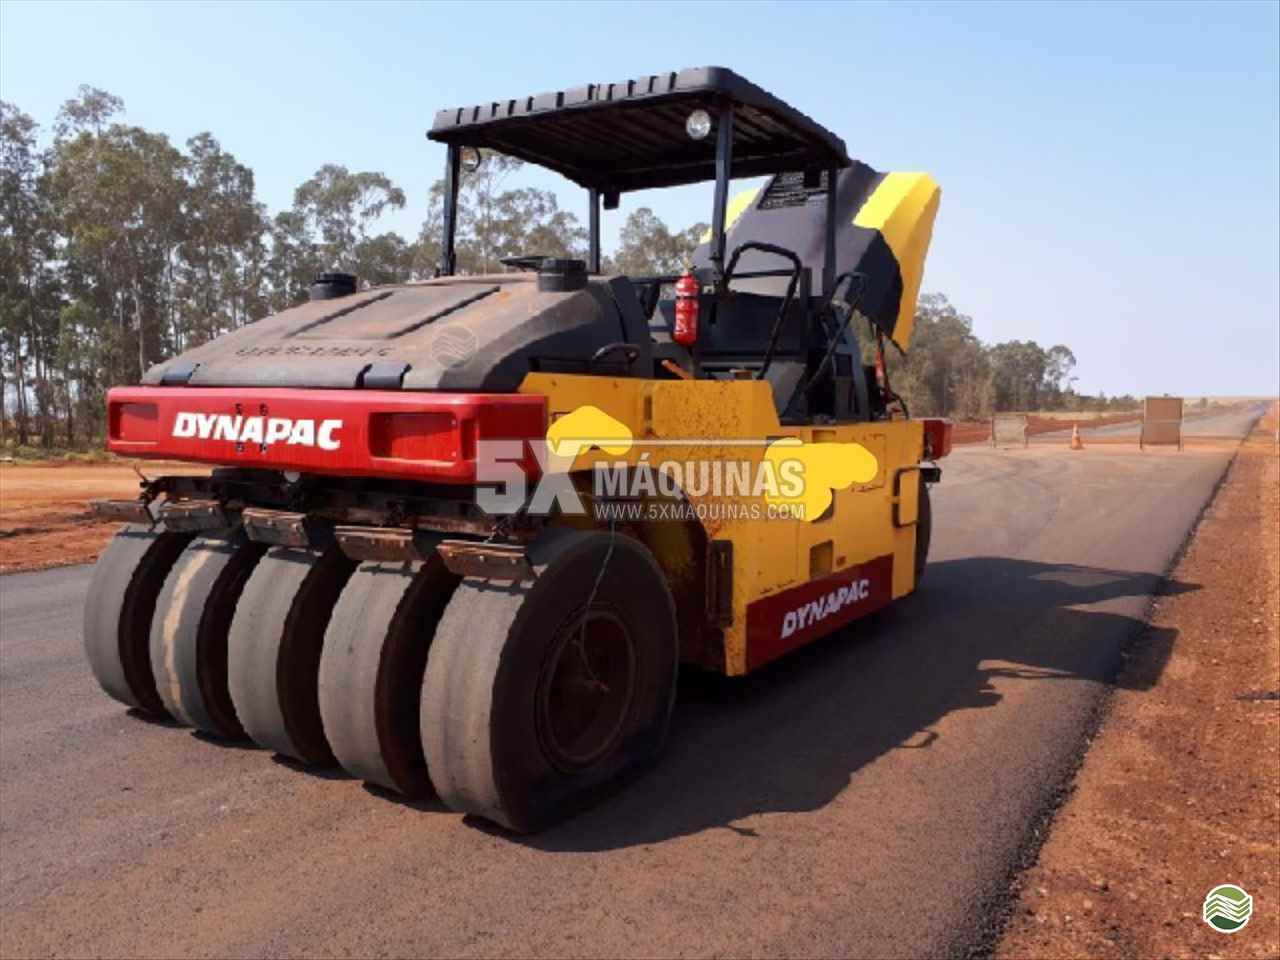 ROLO COMPACTADOR DYNAPAC CP274 5X Máquinas  CAMPO GRANDE MATO GROSSO DO SUL MS